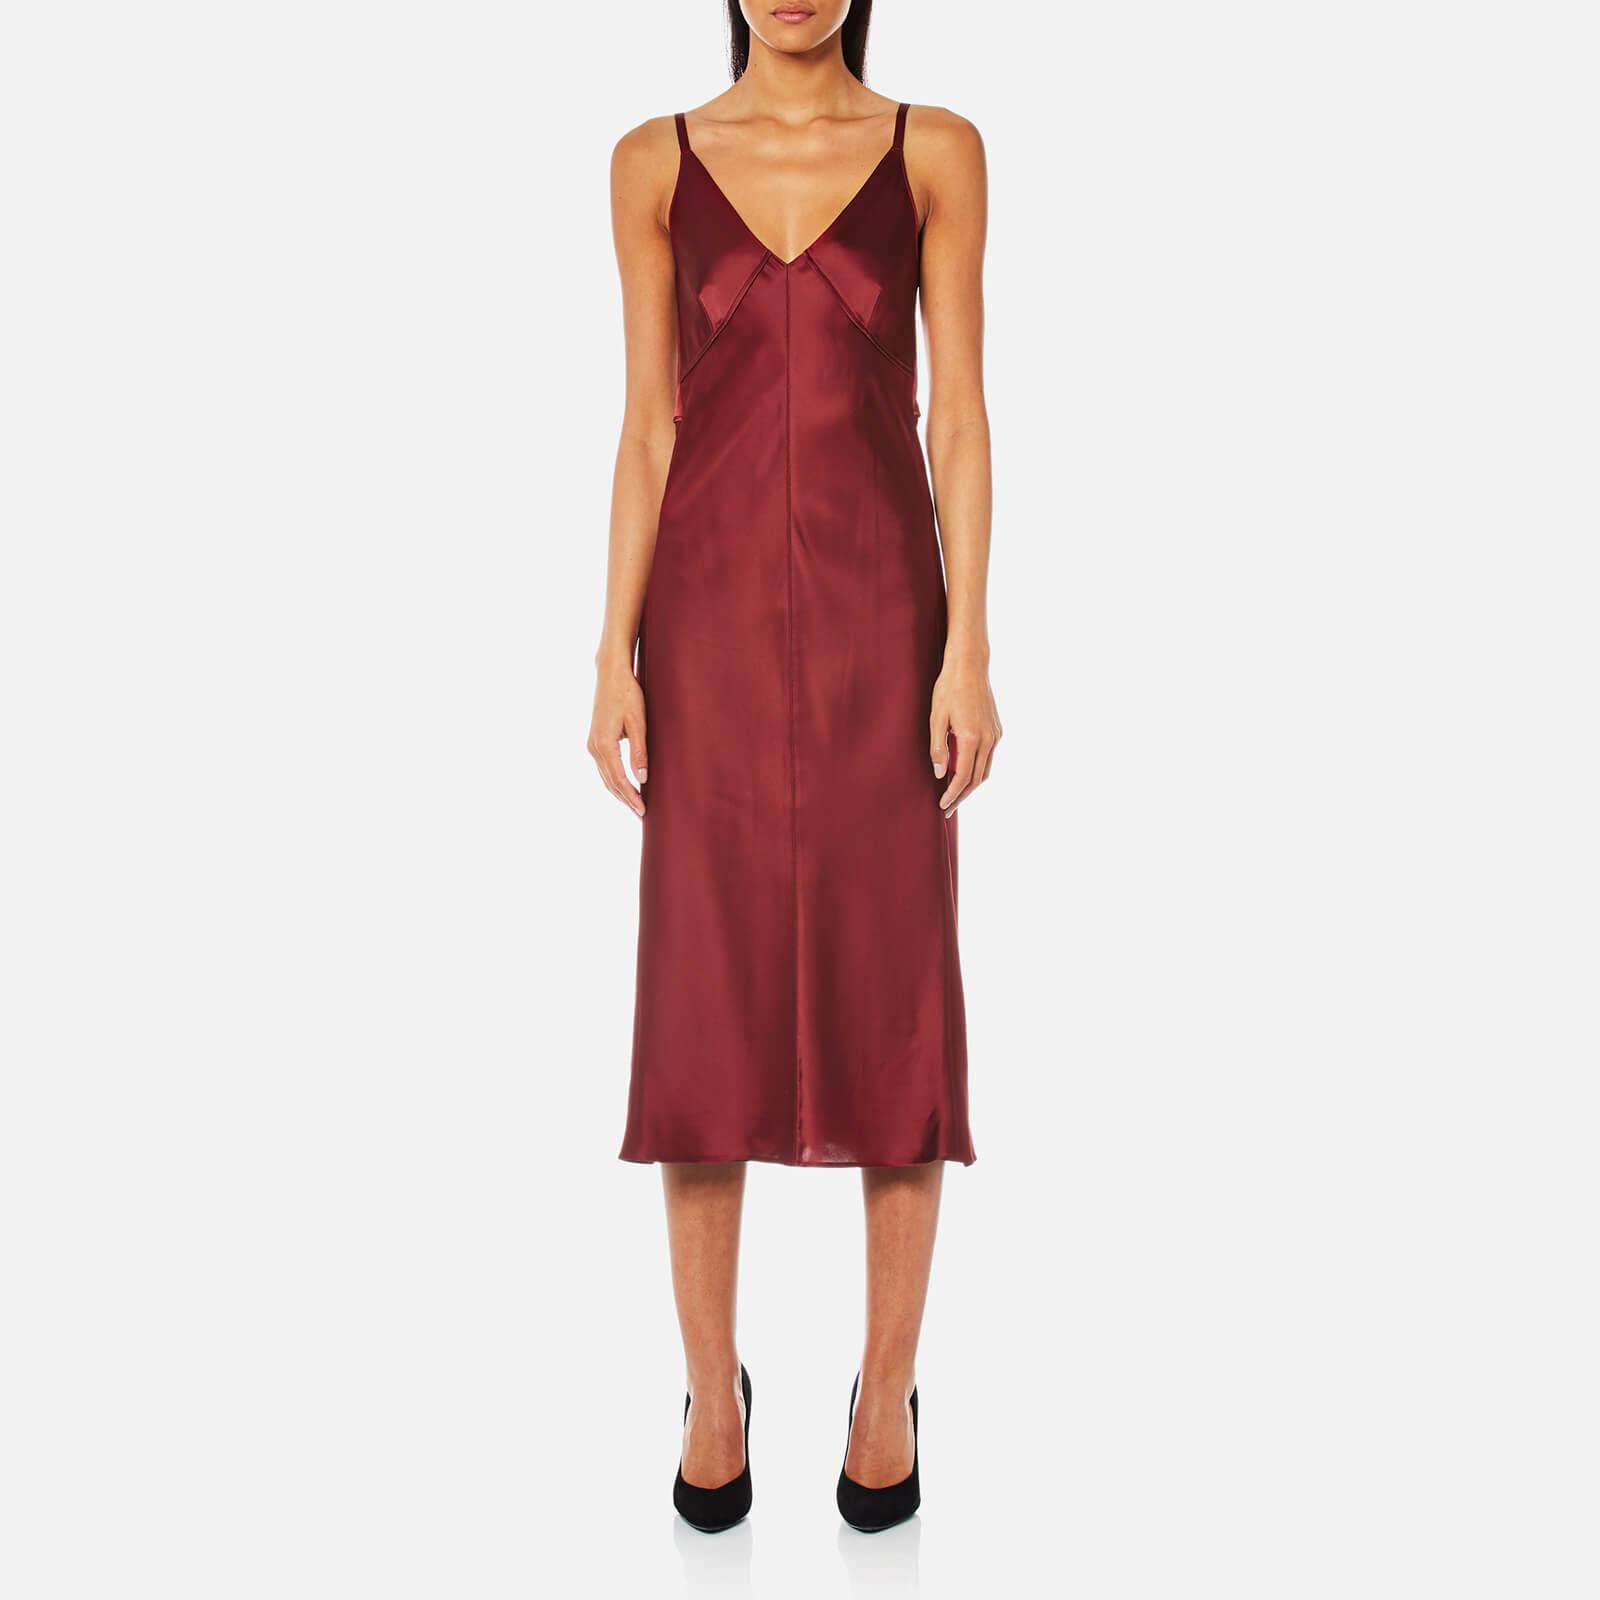 c8a8309bc1ff Helmut Lang Women's Deconstructed Slip Dress - Ruby - Free UK ...